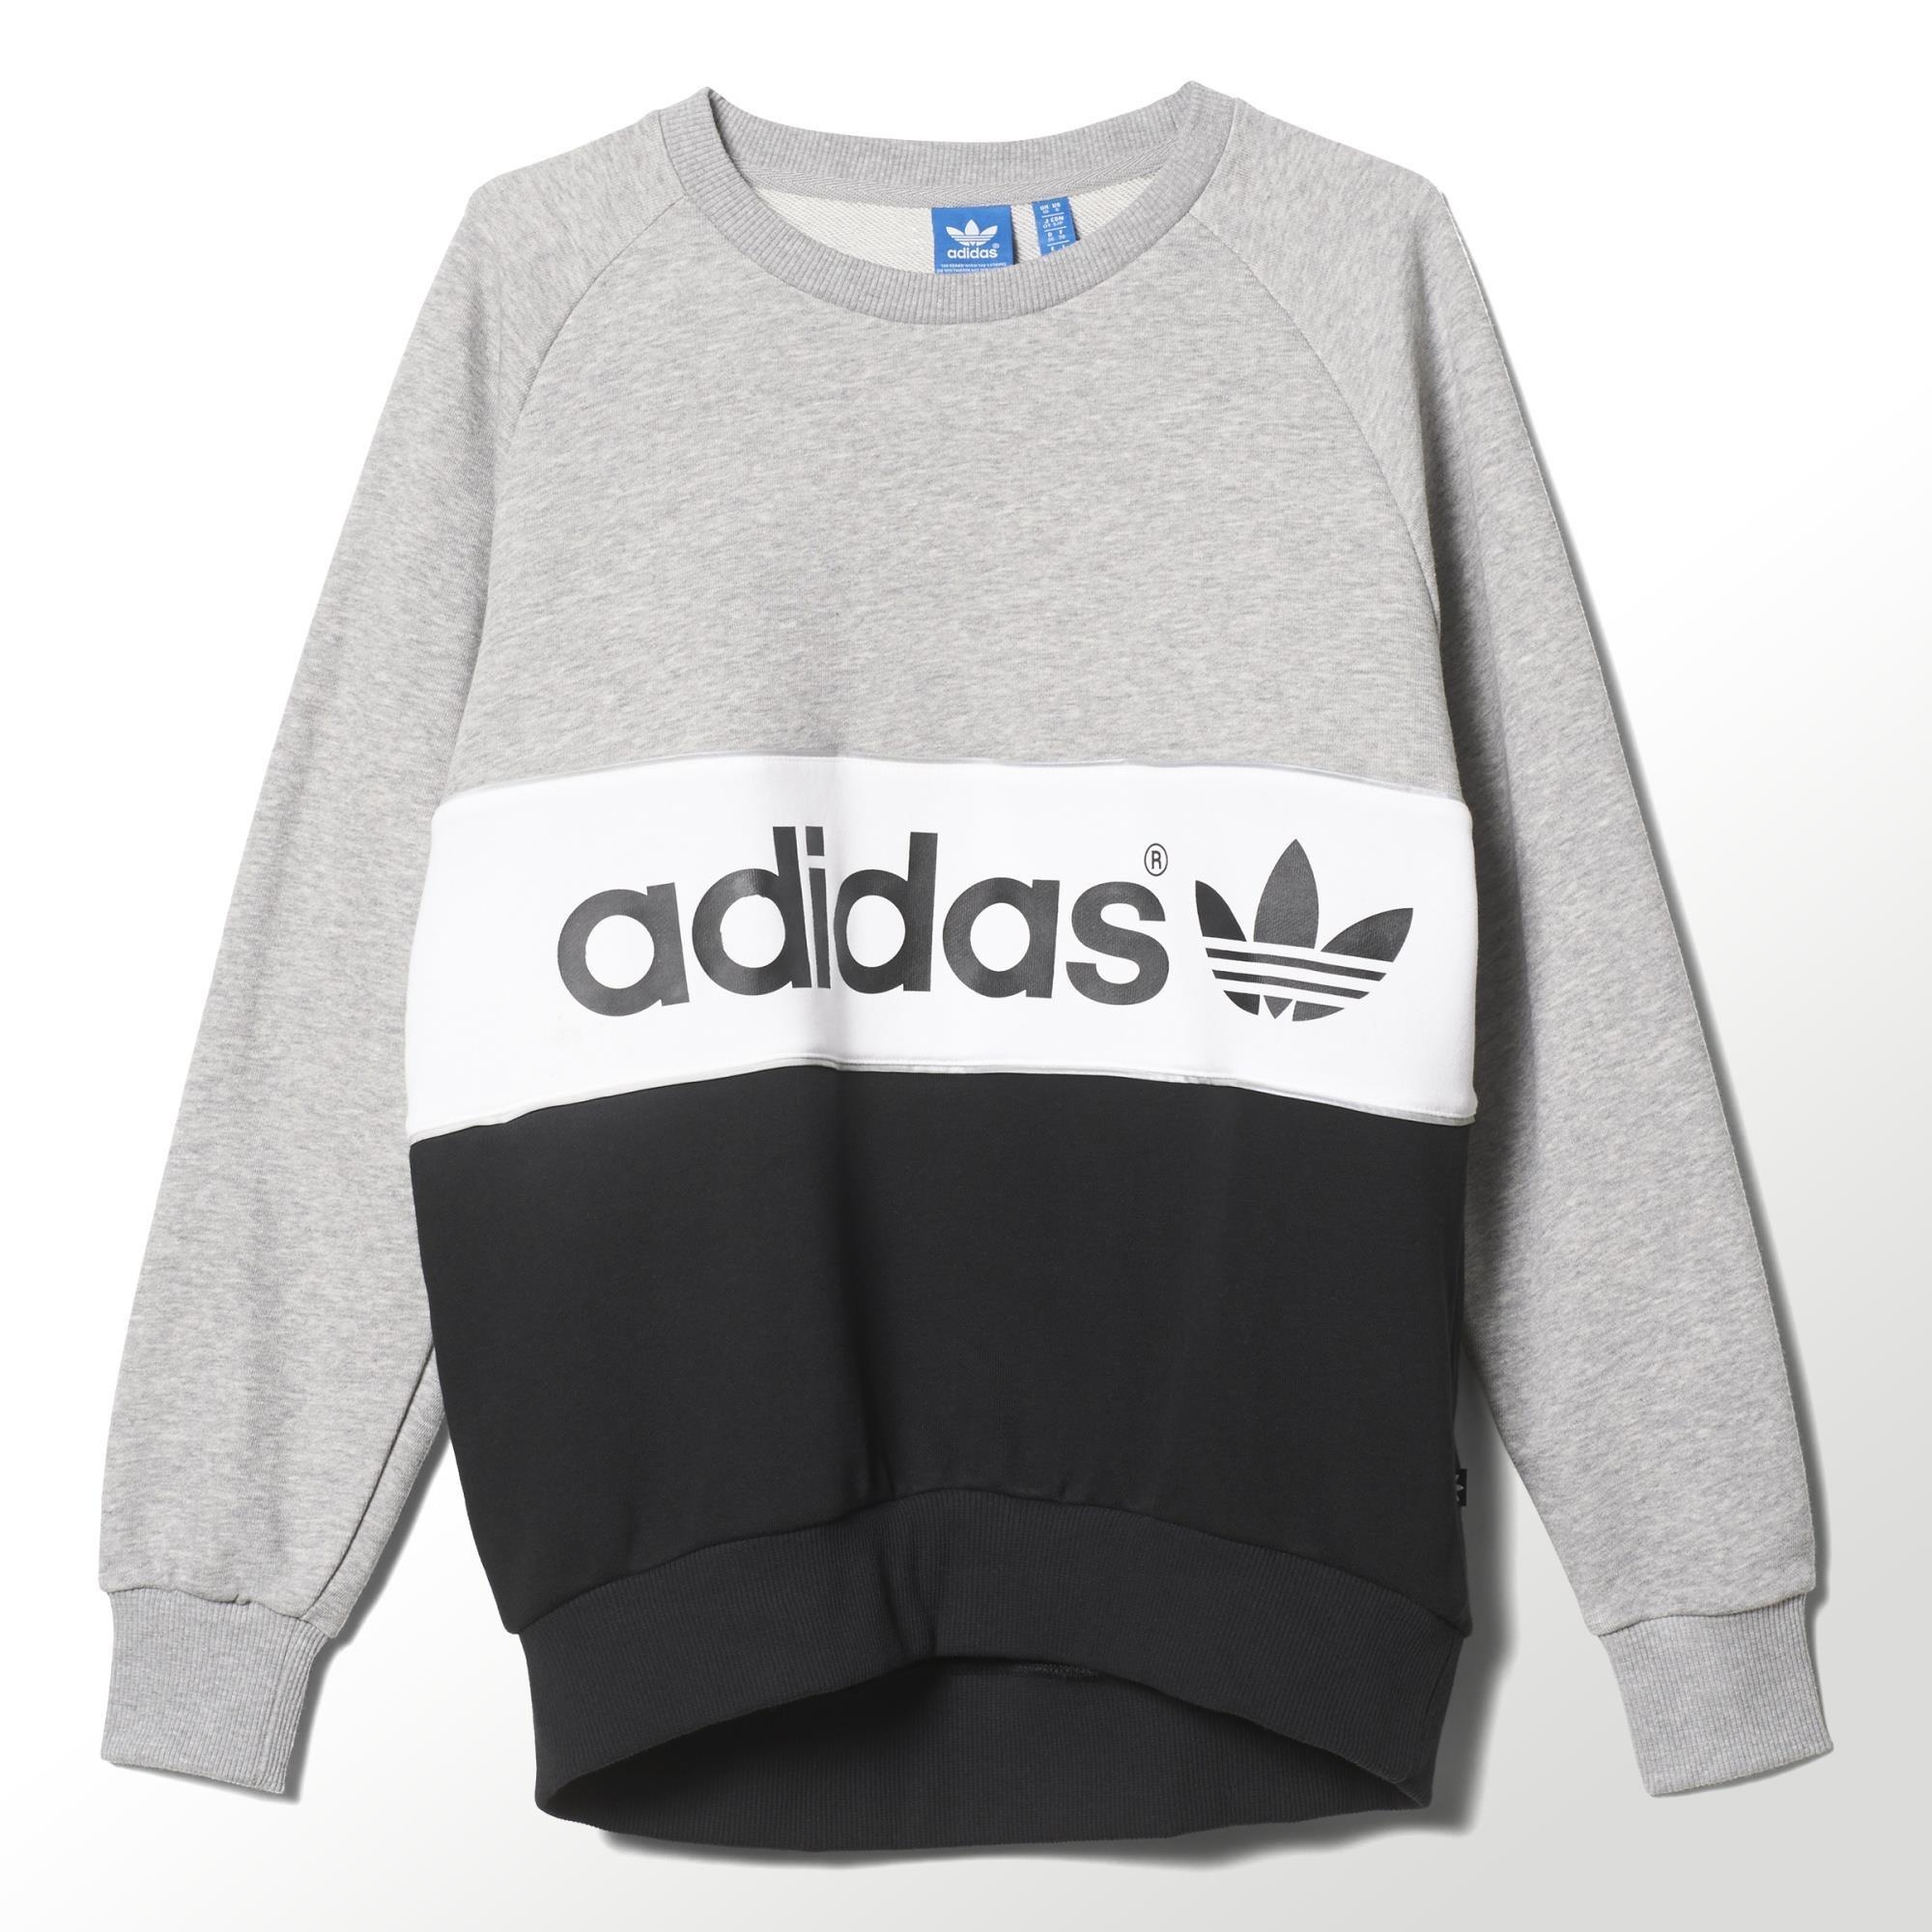 adidas city tokyo sweatshirt adidas us. Black Bedroom Furniture Sets. Home Design Ideas